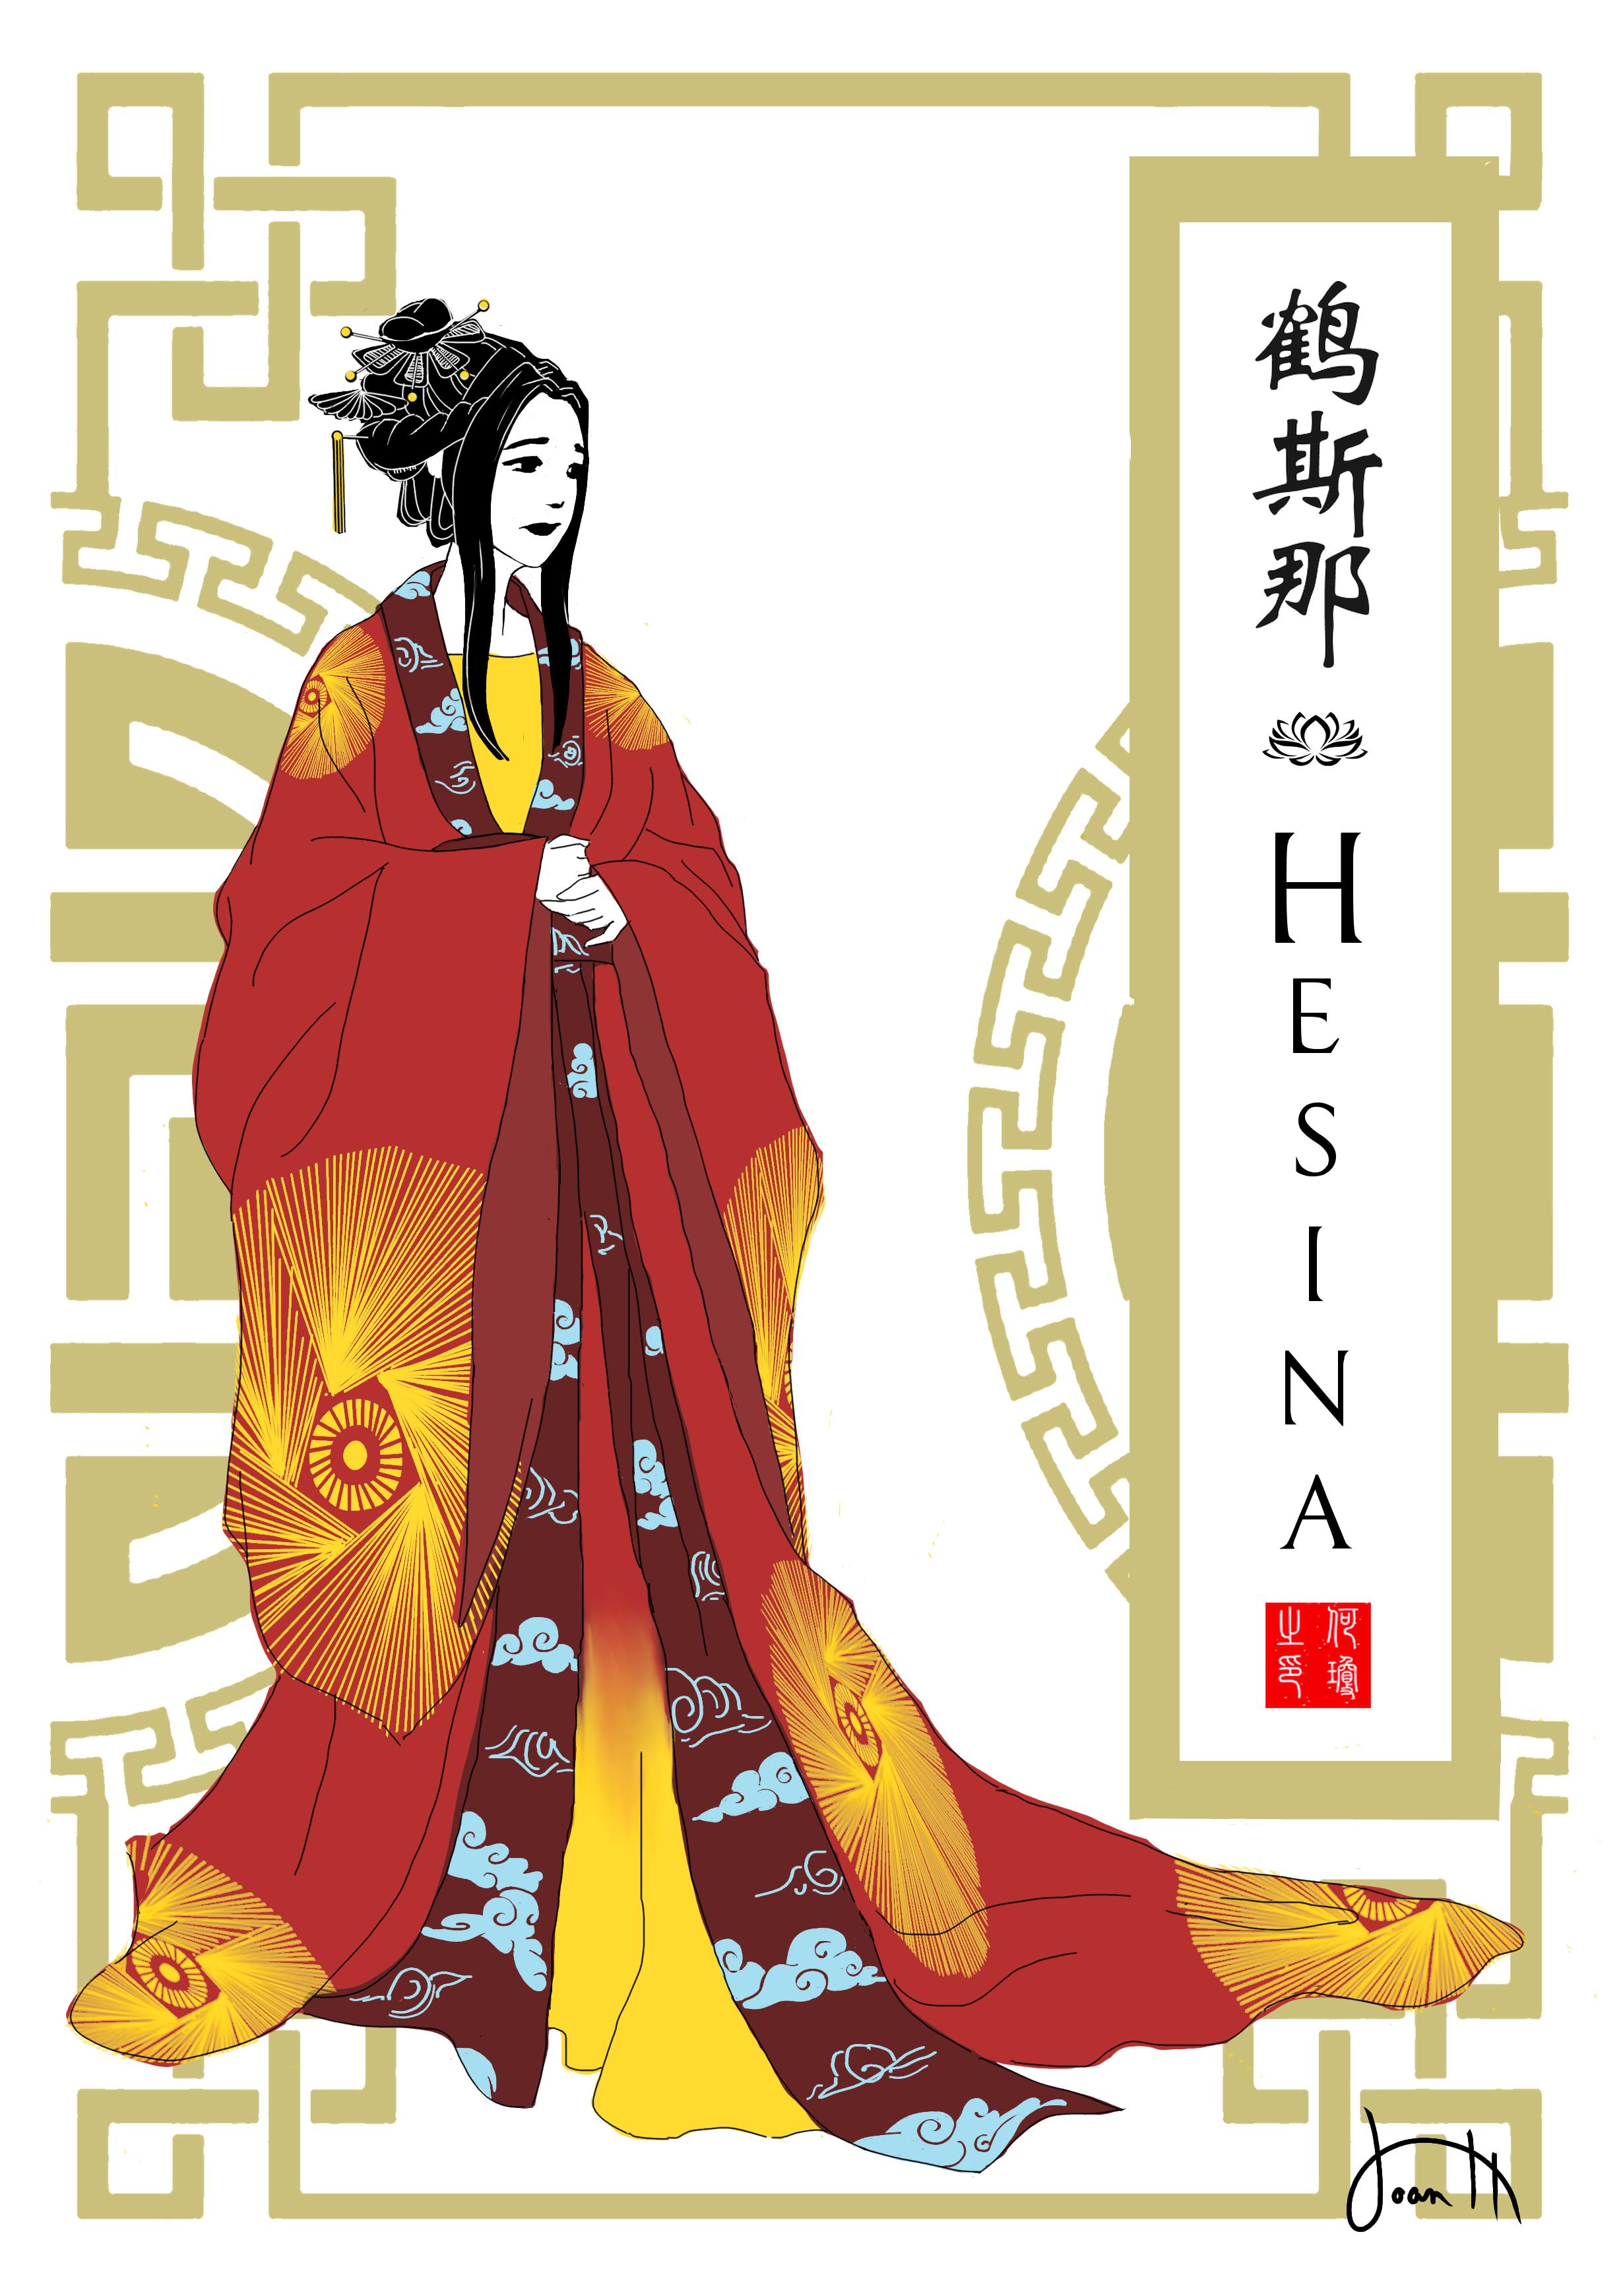 hesina character card.png